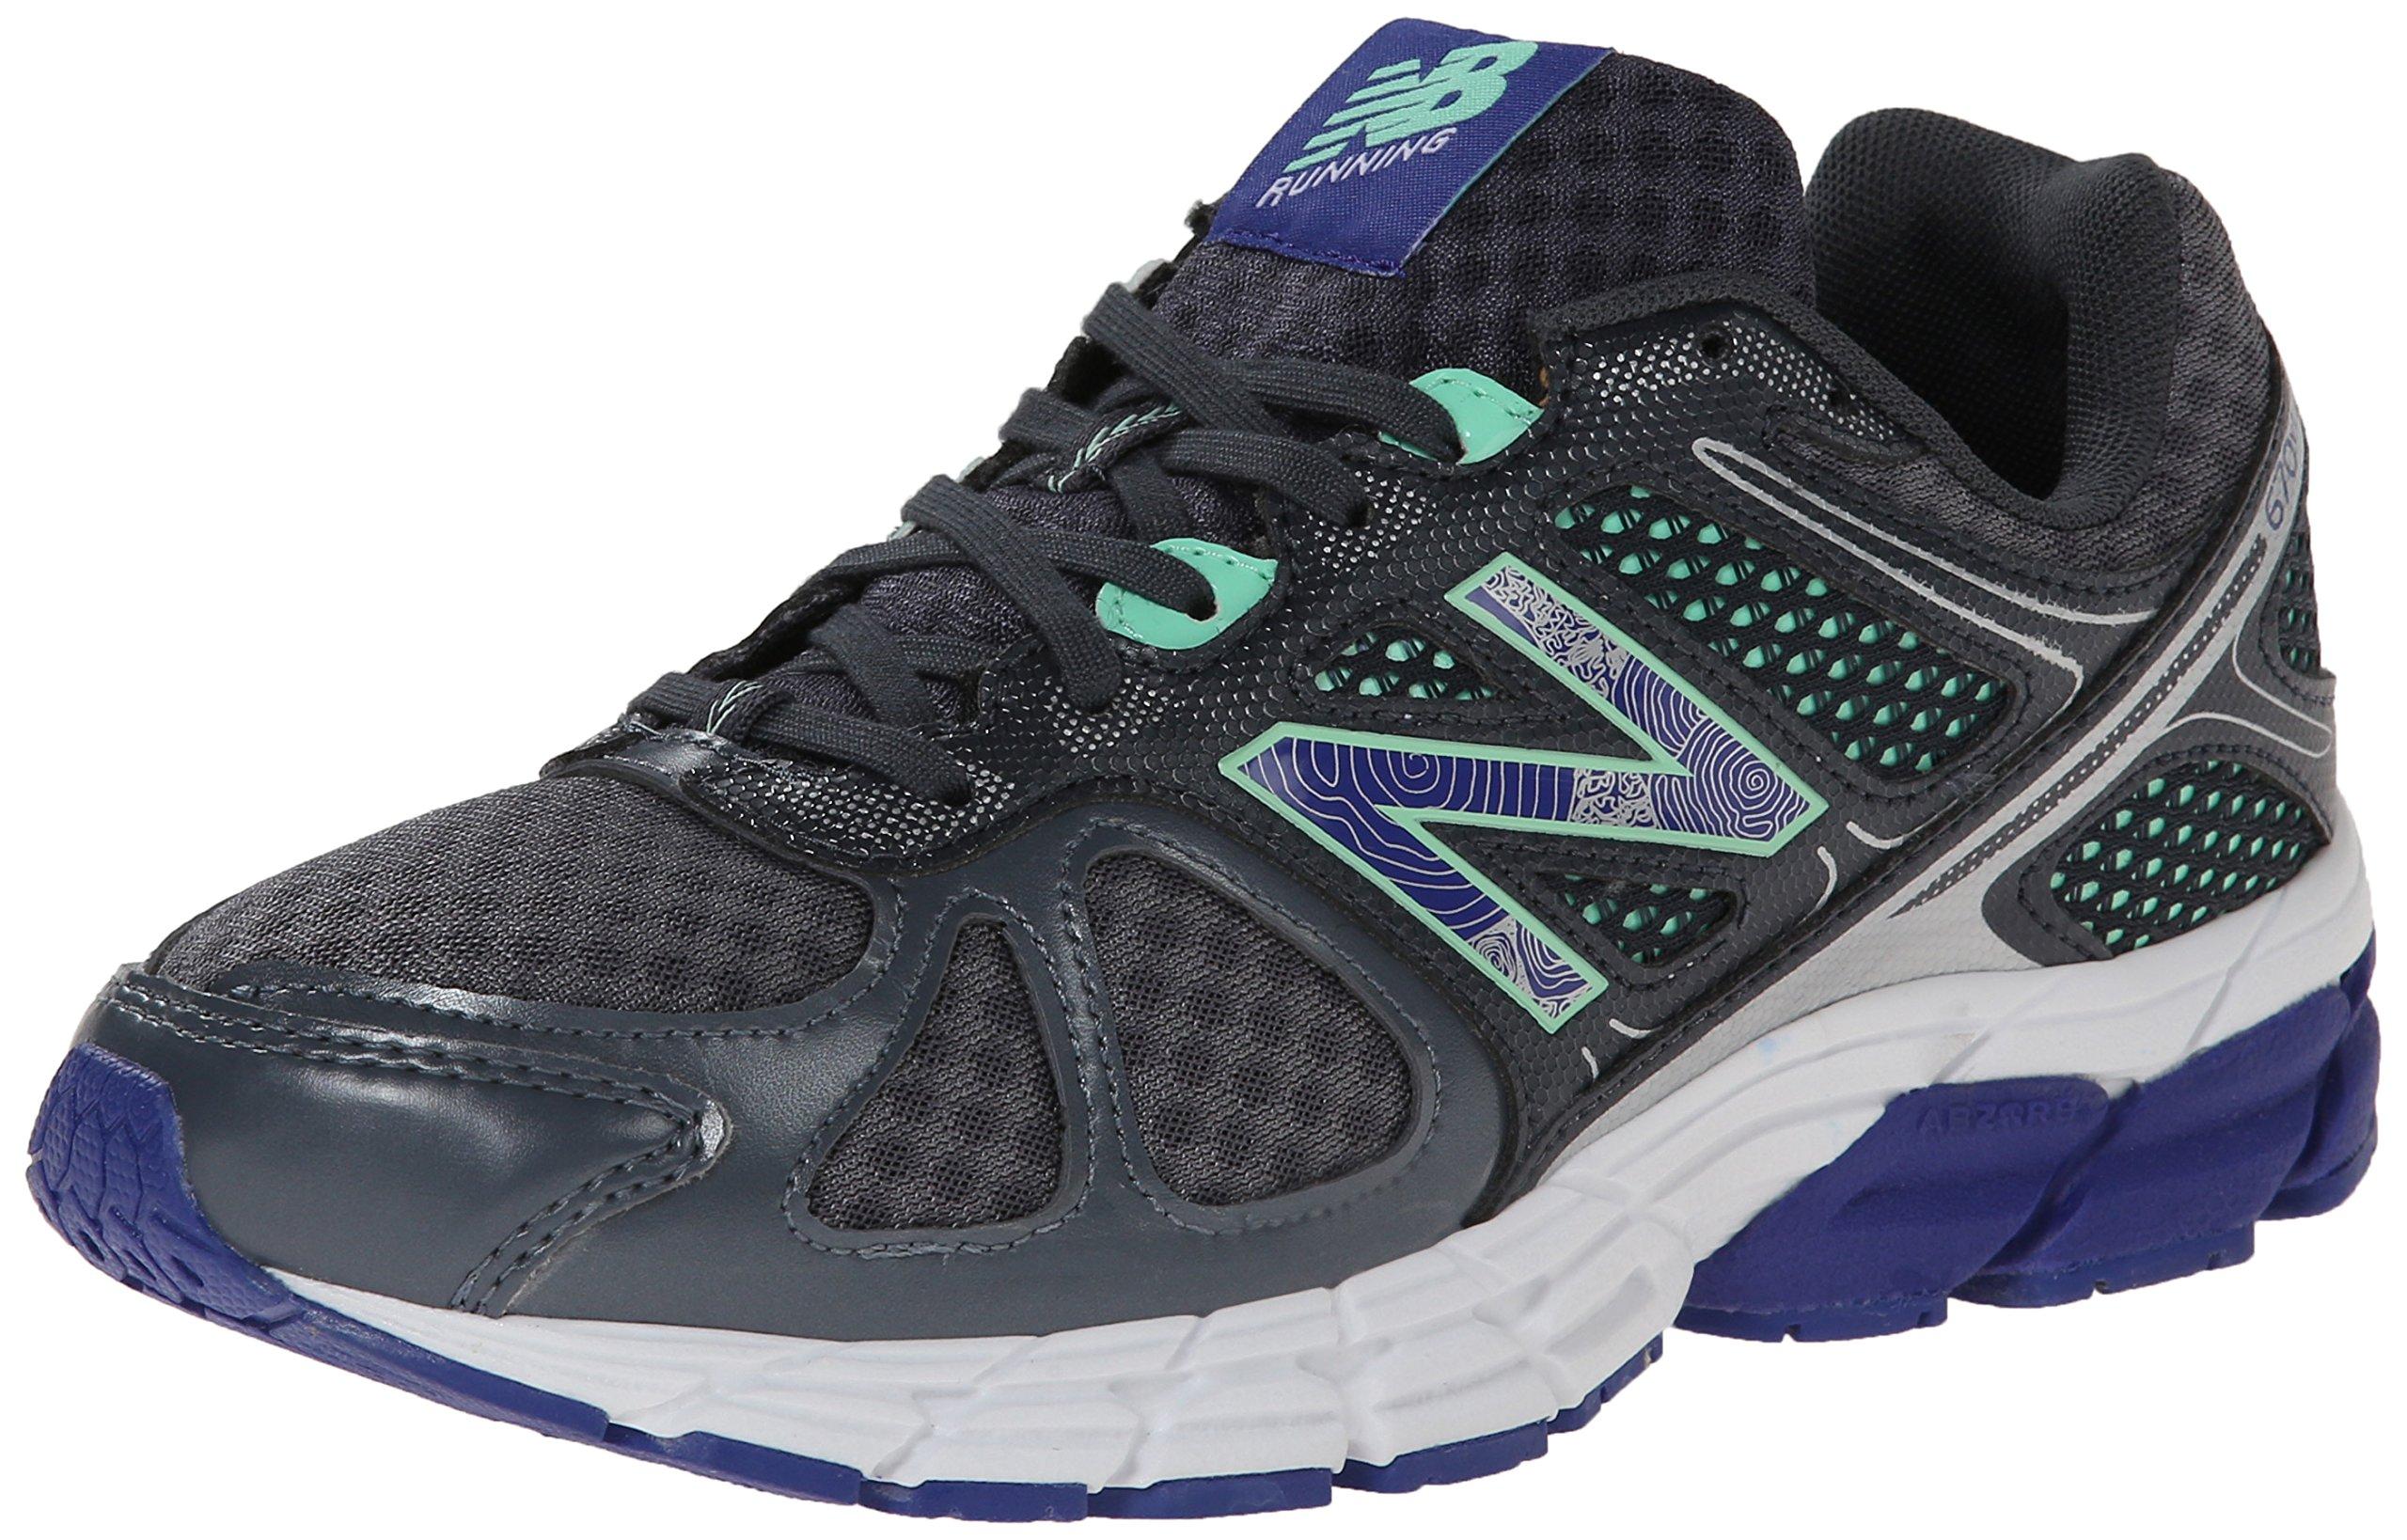 Giầy chính hãng New Balance Women's W670V1 Running Shoe, màu Lead/pistachio, size 6 US/36 EU - 23.5 cm